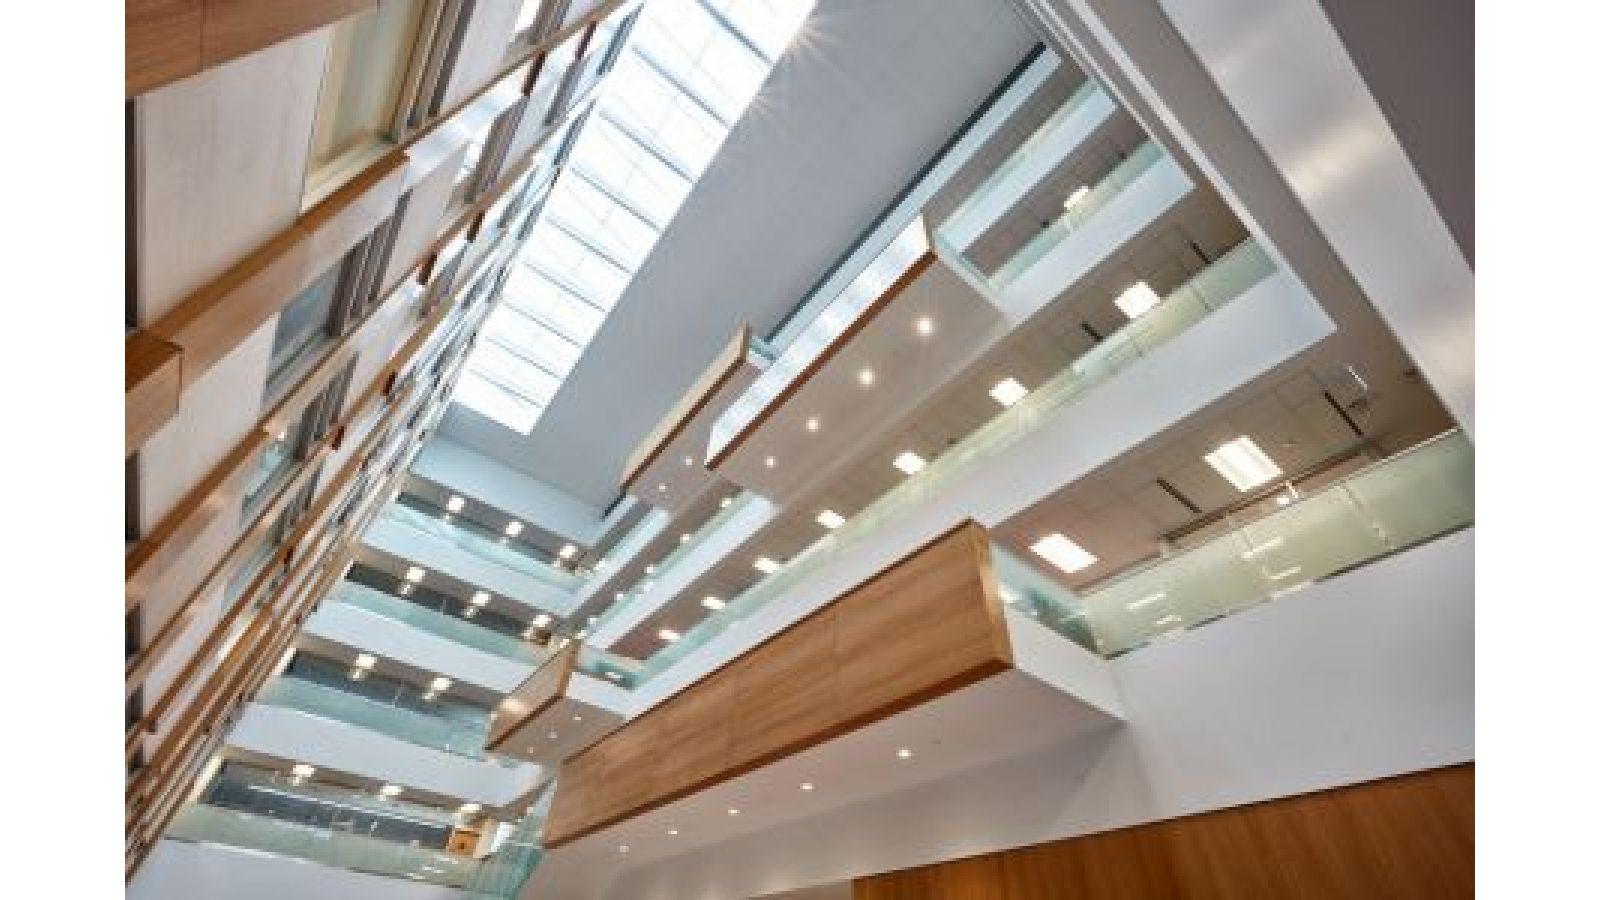 University of Toronto Scarborough, Environmental Science & Chemistry Building